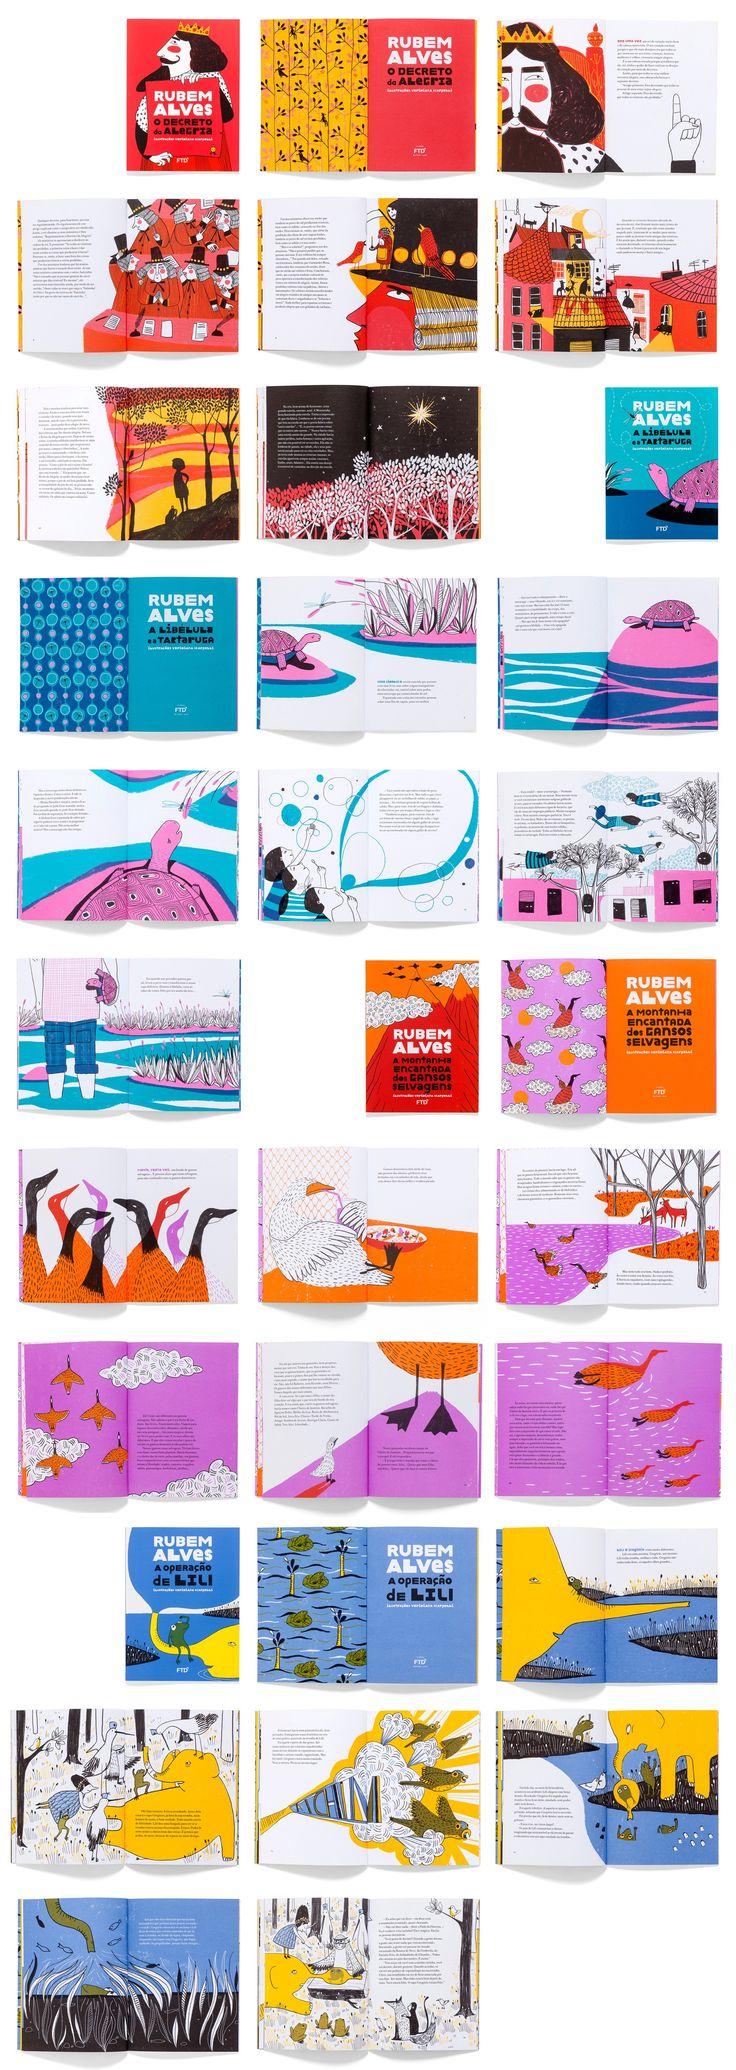 Livro infantil: fetiche dos designers? – tereza bettinardi – Medium